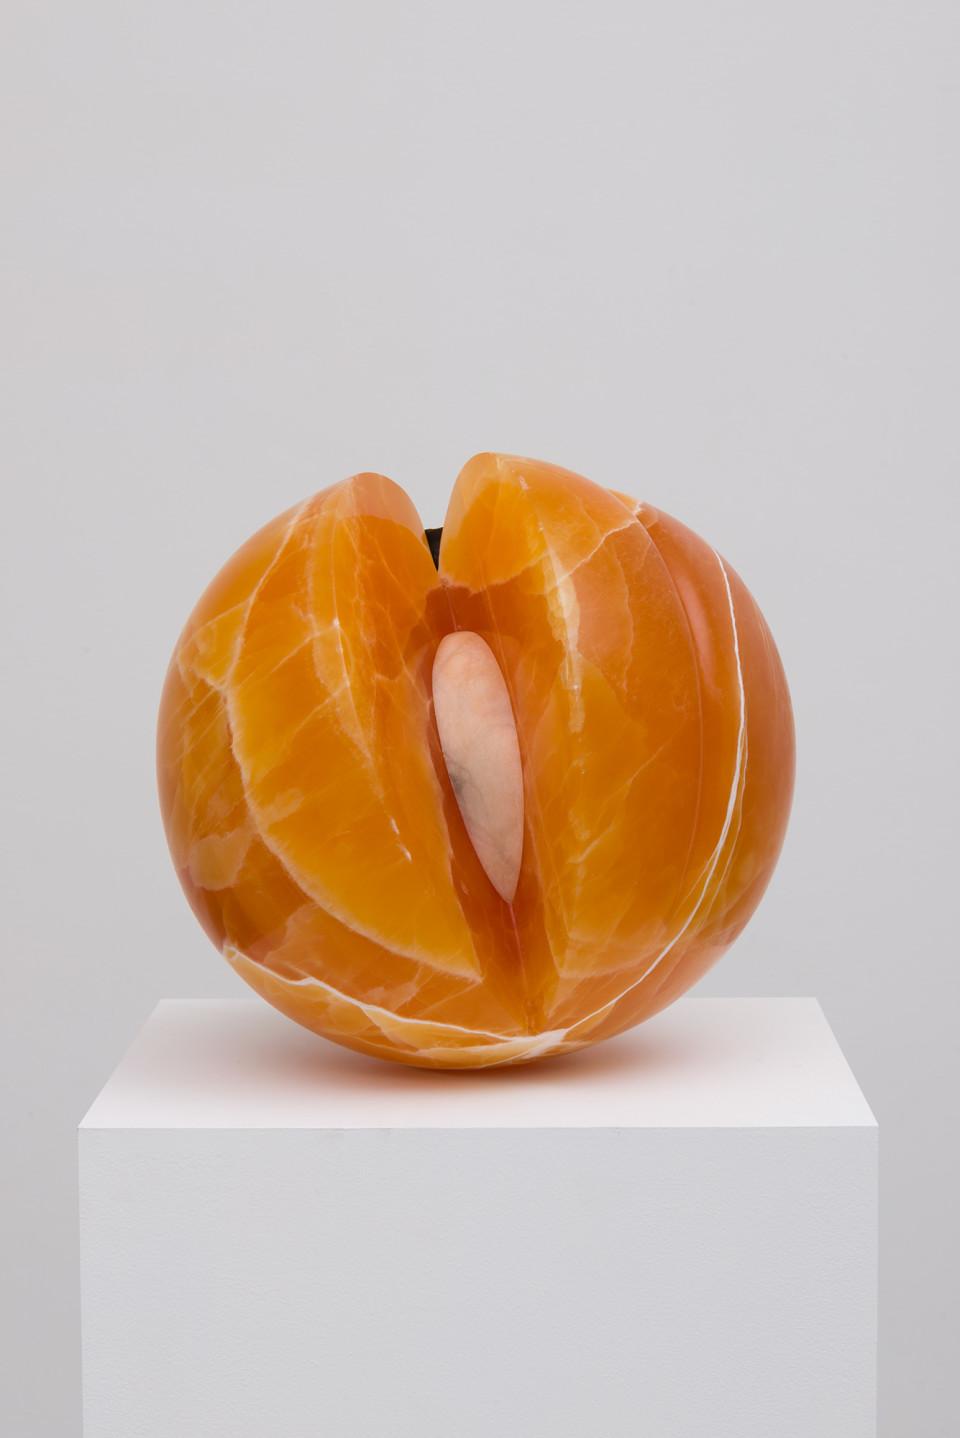 Miss her (peach)